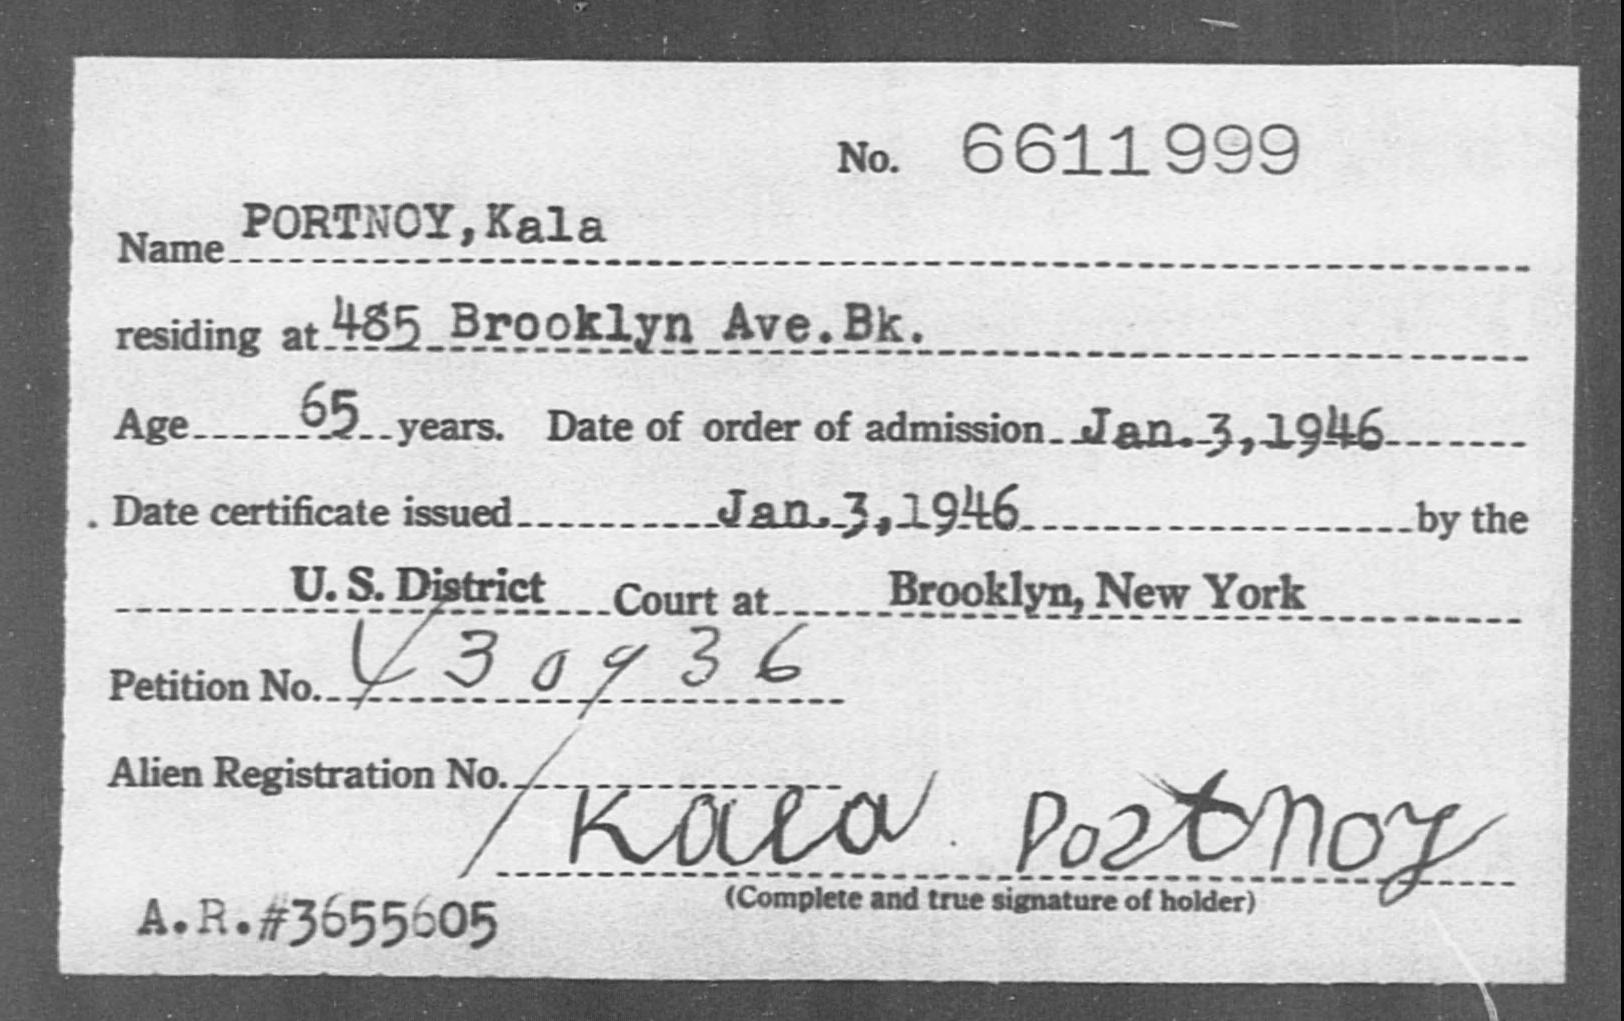 PORTNOY, Kala - Born: [BLANK], Naturalized: 1946